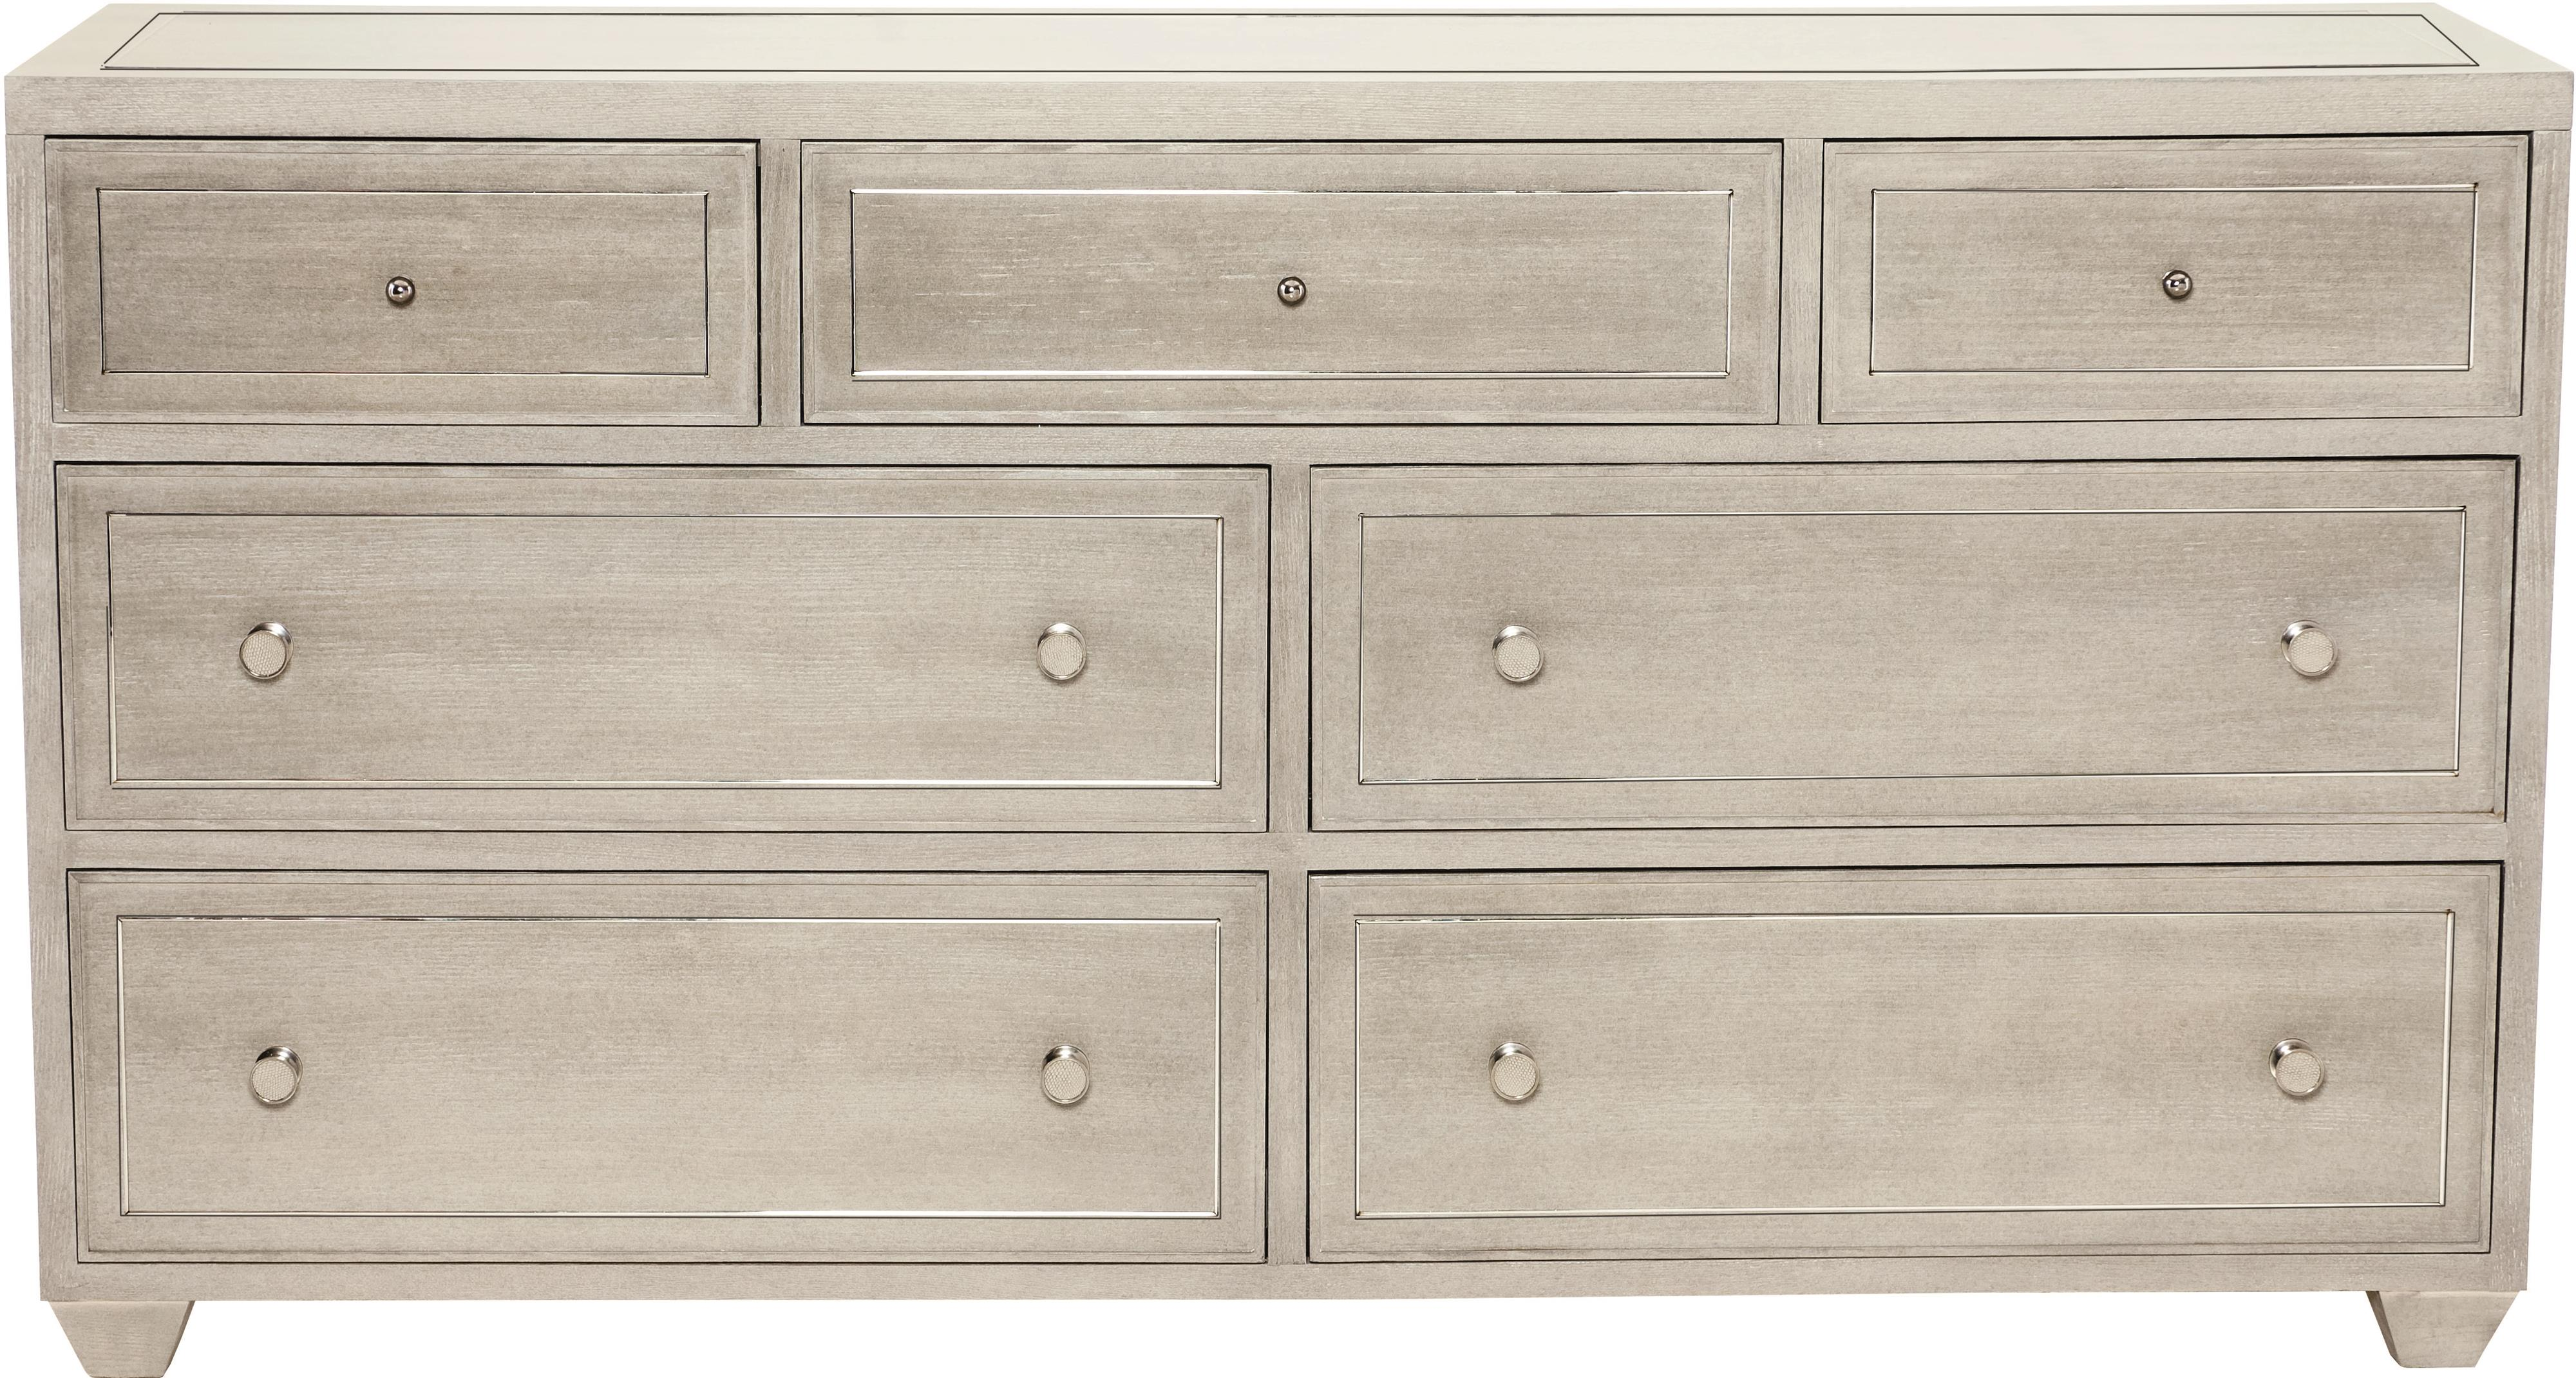 Bernhardt Criteria Dresser - Item Number: 363-051G